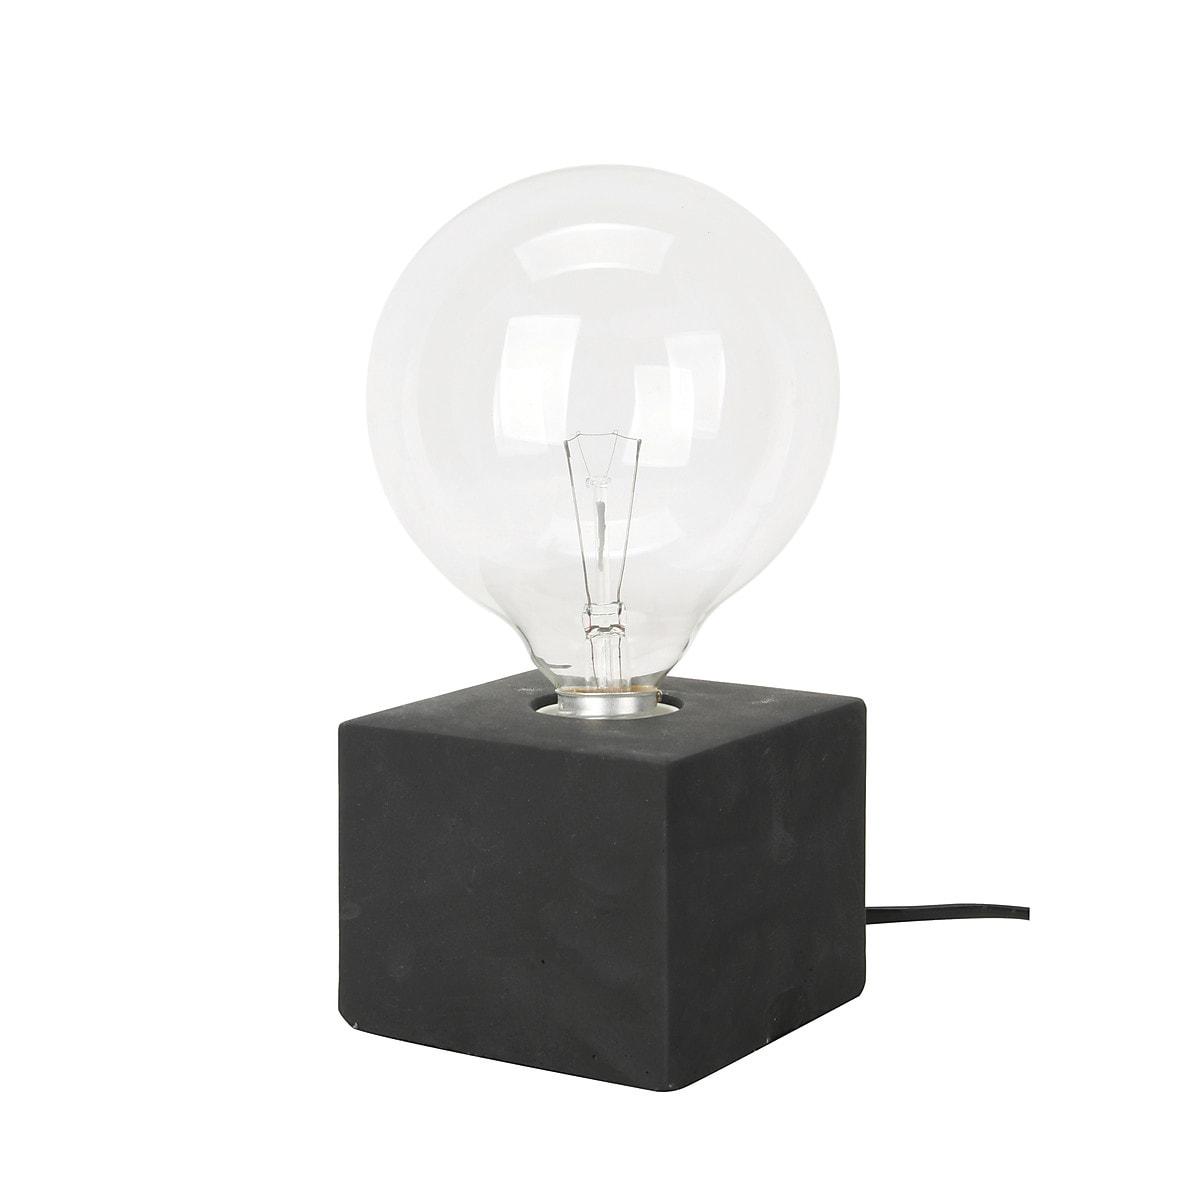 Bordslampa Cube Northlight | Clas Ohlson